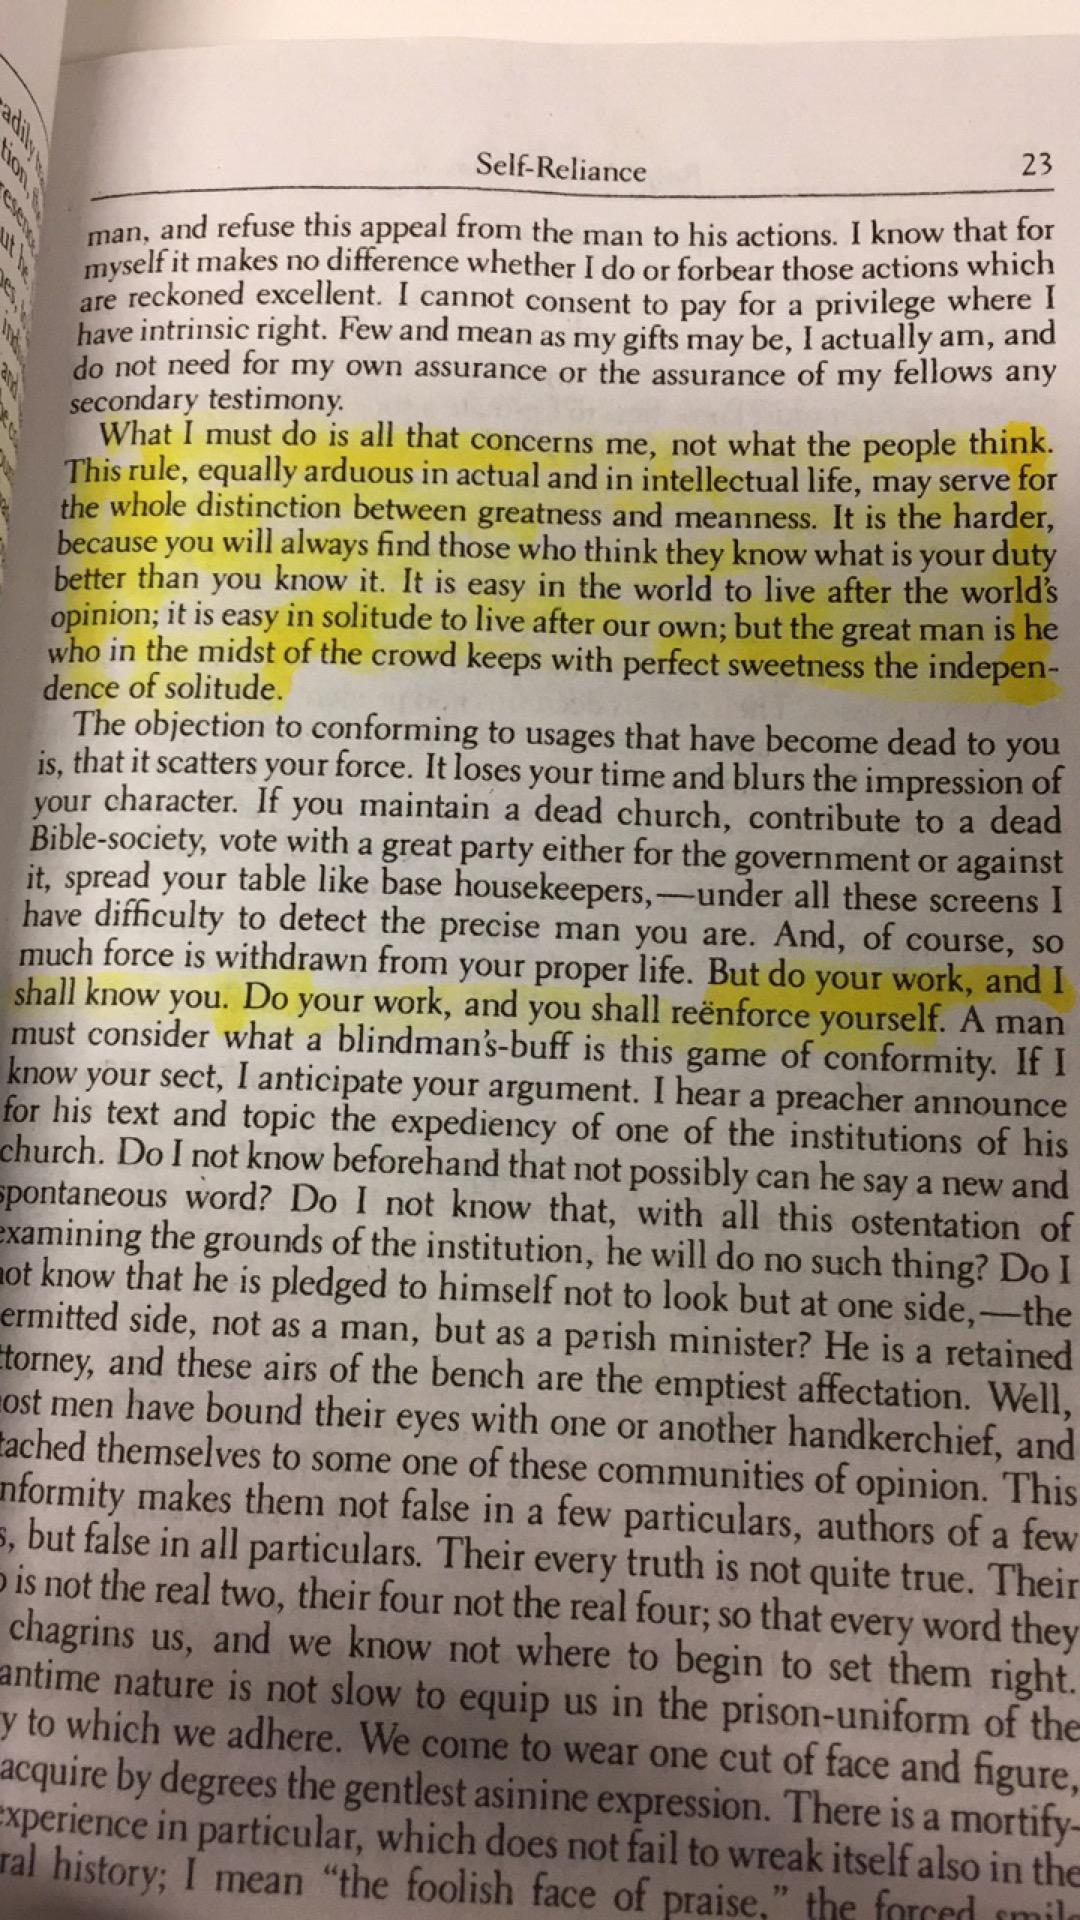 010 Self Reliance And Other Essays By Ralph Waldo Emerson Summary Essay Formidable Pdf Ekşi Full